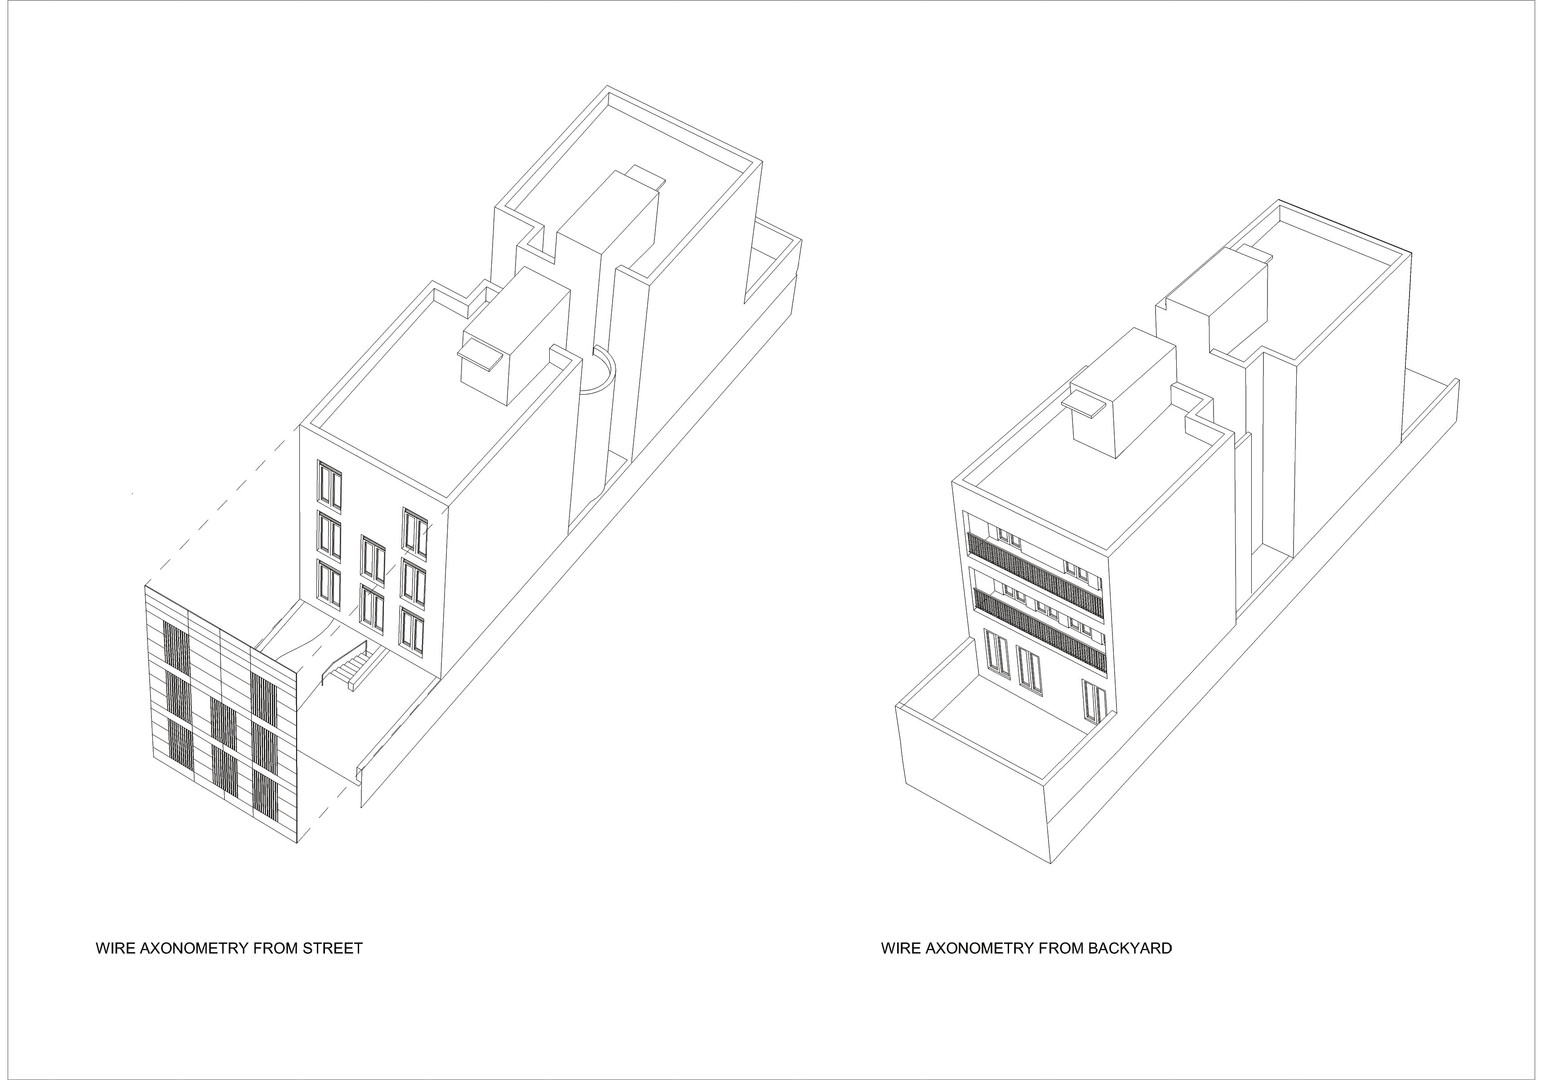 RS03_09_N1 Housing_Studio Simovic_ wire